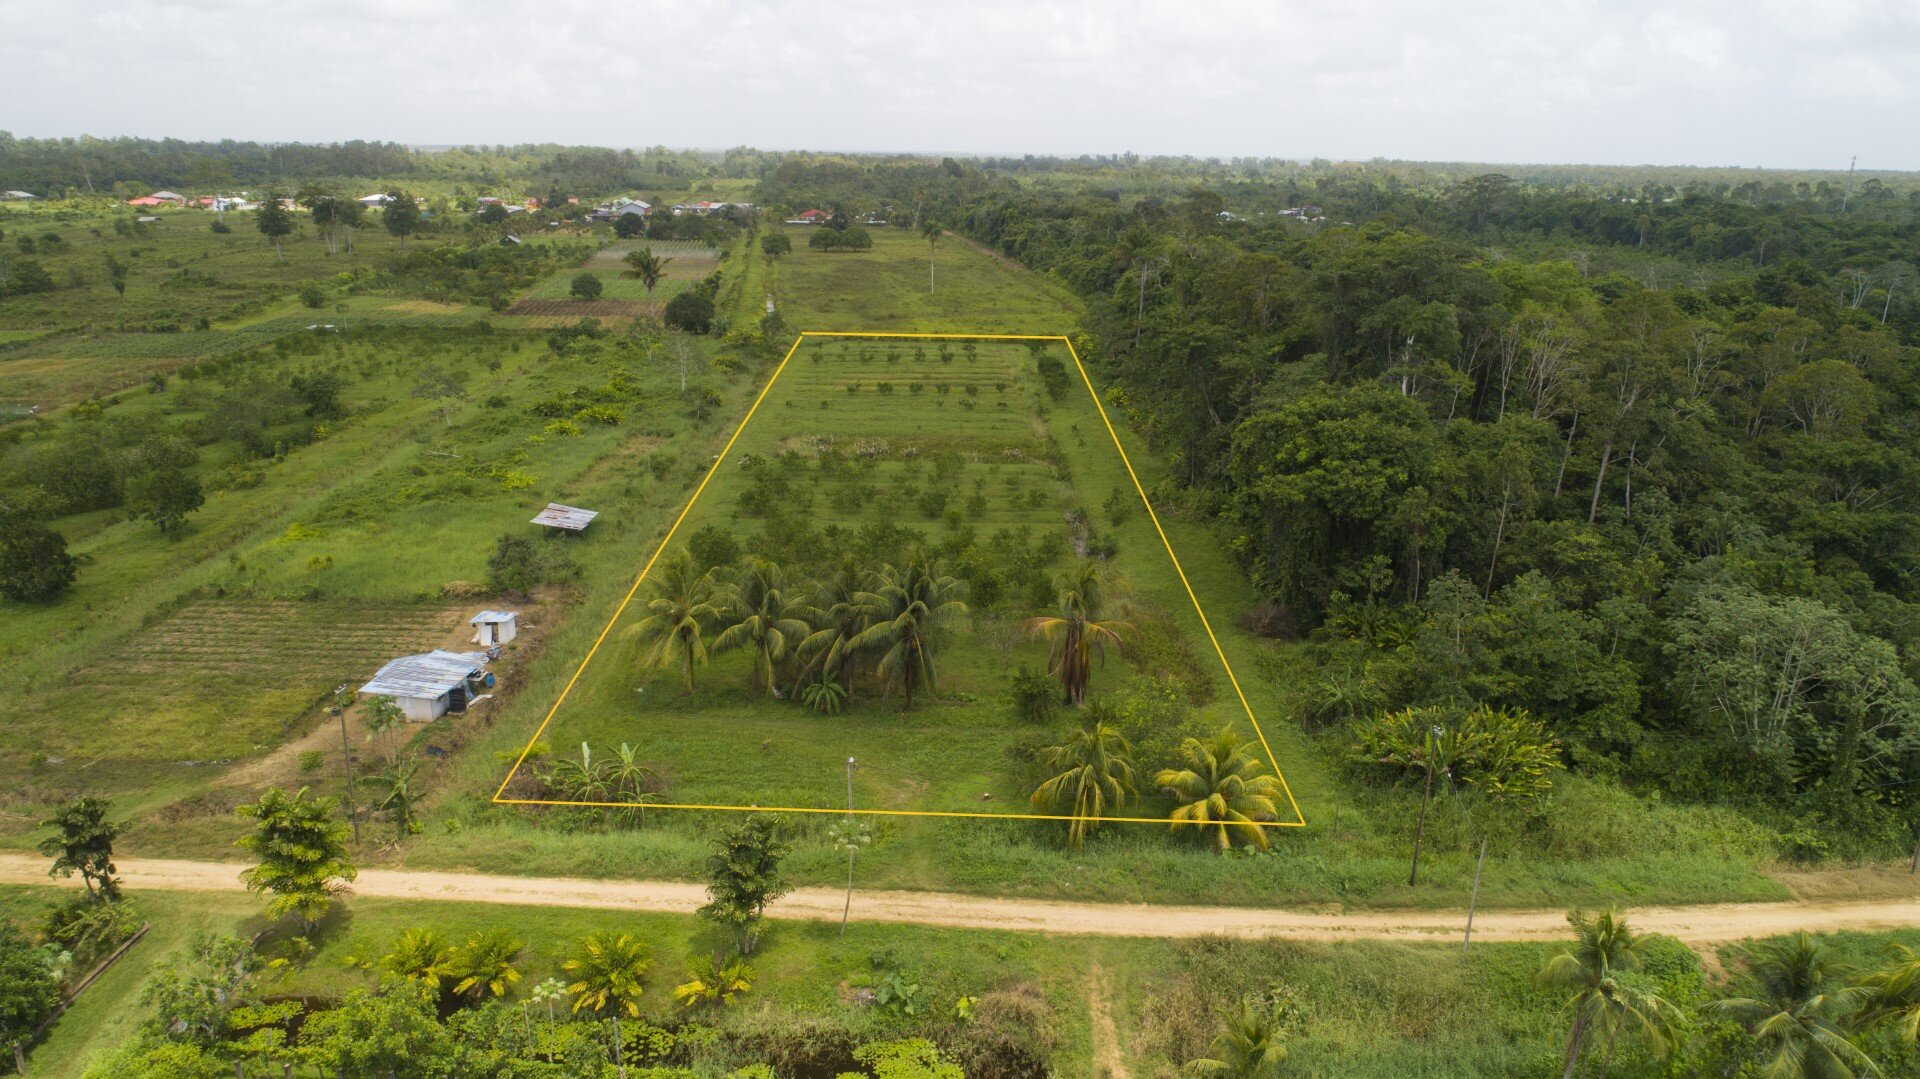 Colaproject perc. 145, nabij Tijgerkreek Westweg - 1 ha. citrusplantage te Saramacca - Surgoed Makelaardij NV - Paramaribo, Suriname